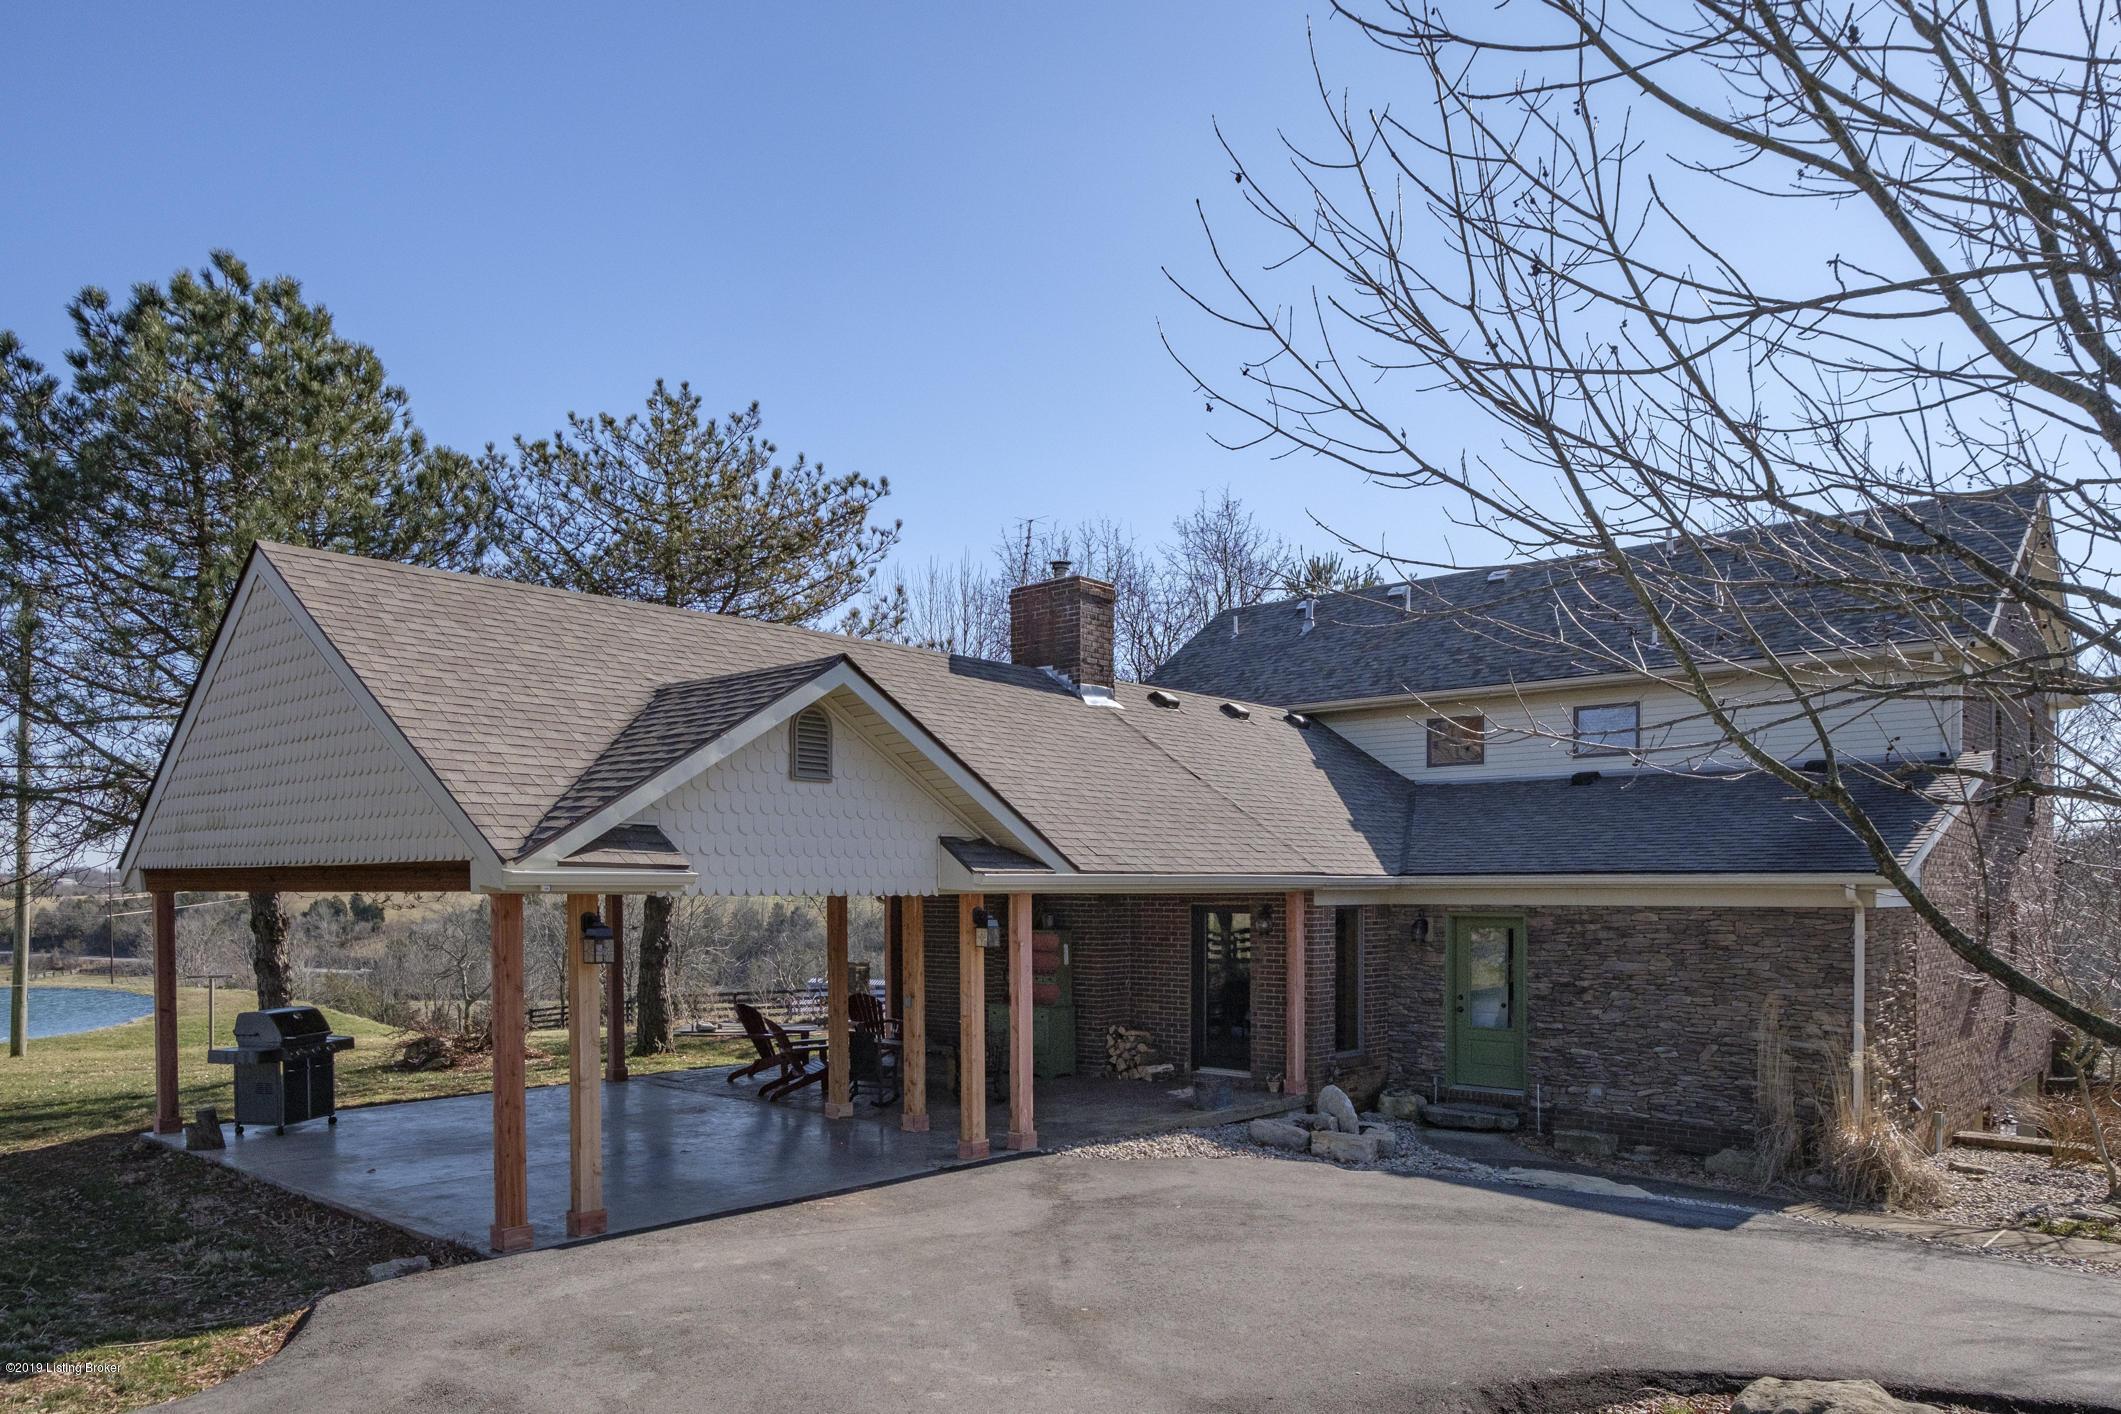 1500 Samuels Rd, Coxs Creek, Kentucky 40013, 4 Bedrooms Bedrooms, 6 Rooms Rooms,4 BathroomsBathrooms,Residential,For Sale,Samuels,1524749